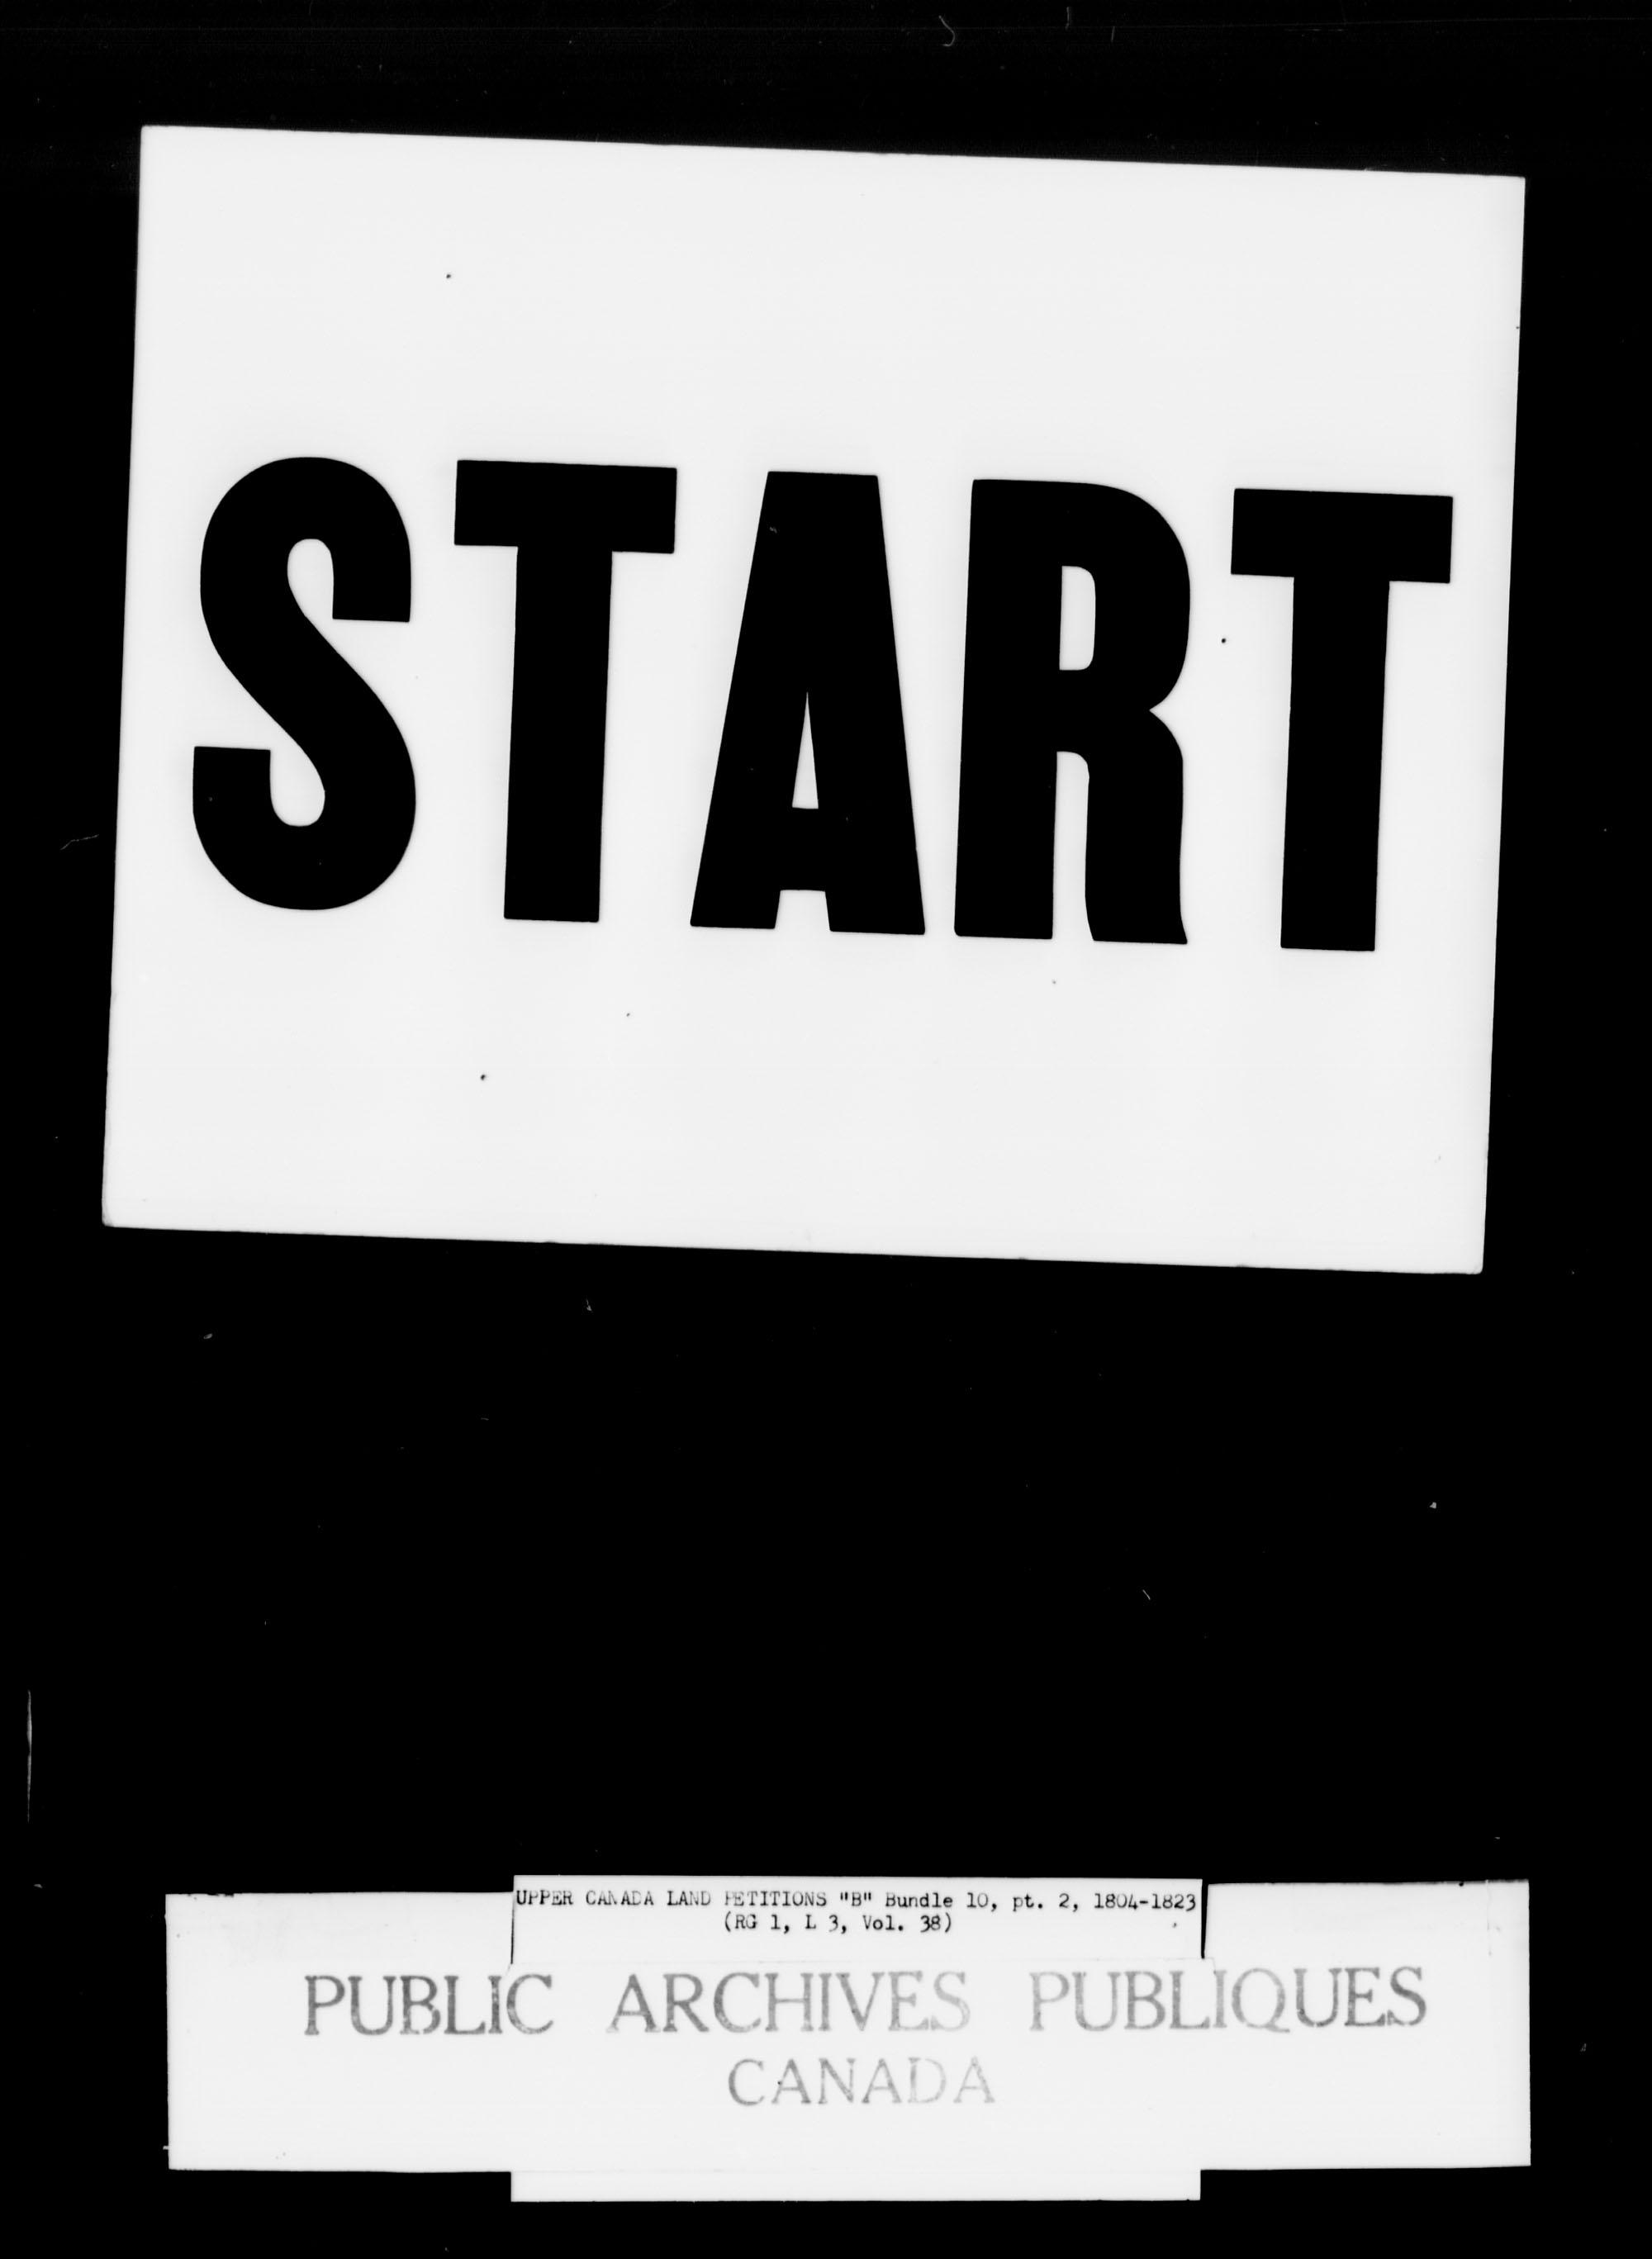 Titre: Demandes de terres du Haut-Canada (1763-1865) - N° d'enregistrement Mikan: 205131 - Microforme: c-1624